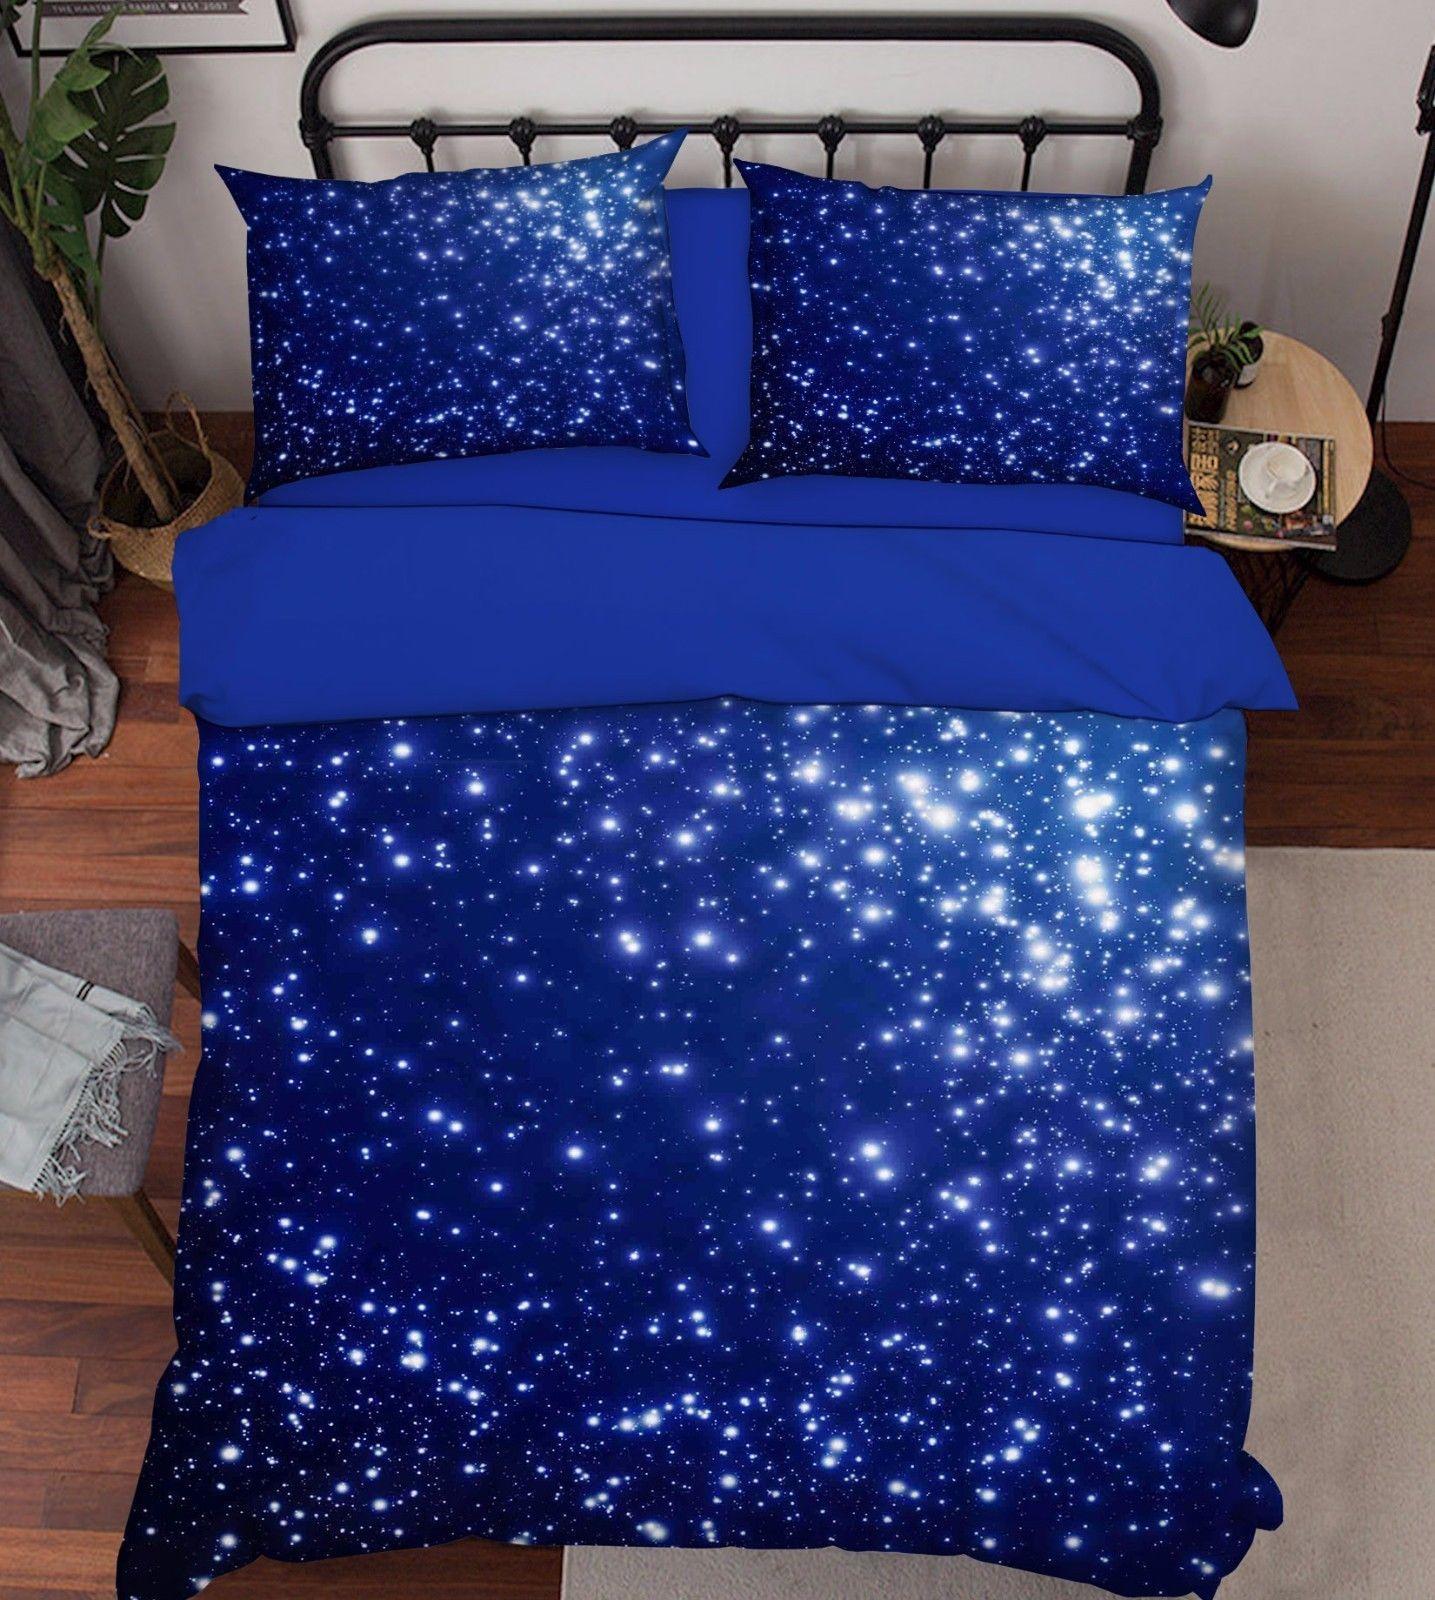 3D Shiny Stars 2 Bed Pillowcases Quilt Duvet Cover Set Single Queen King Size AU - $64.32 - $96.47